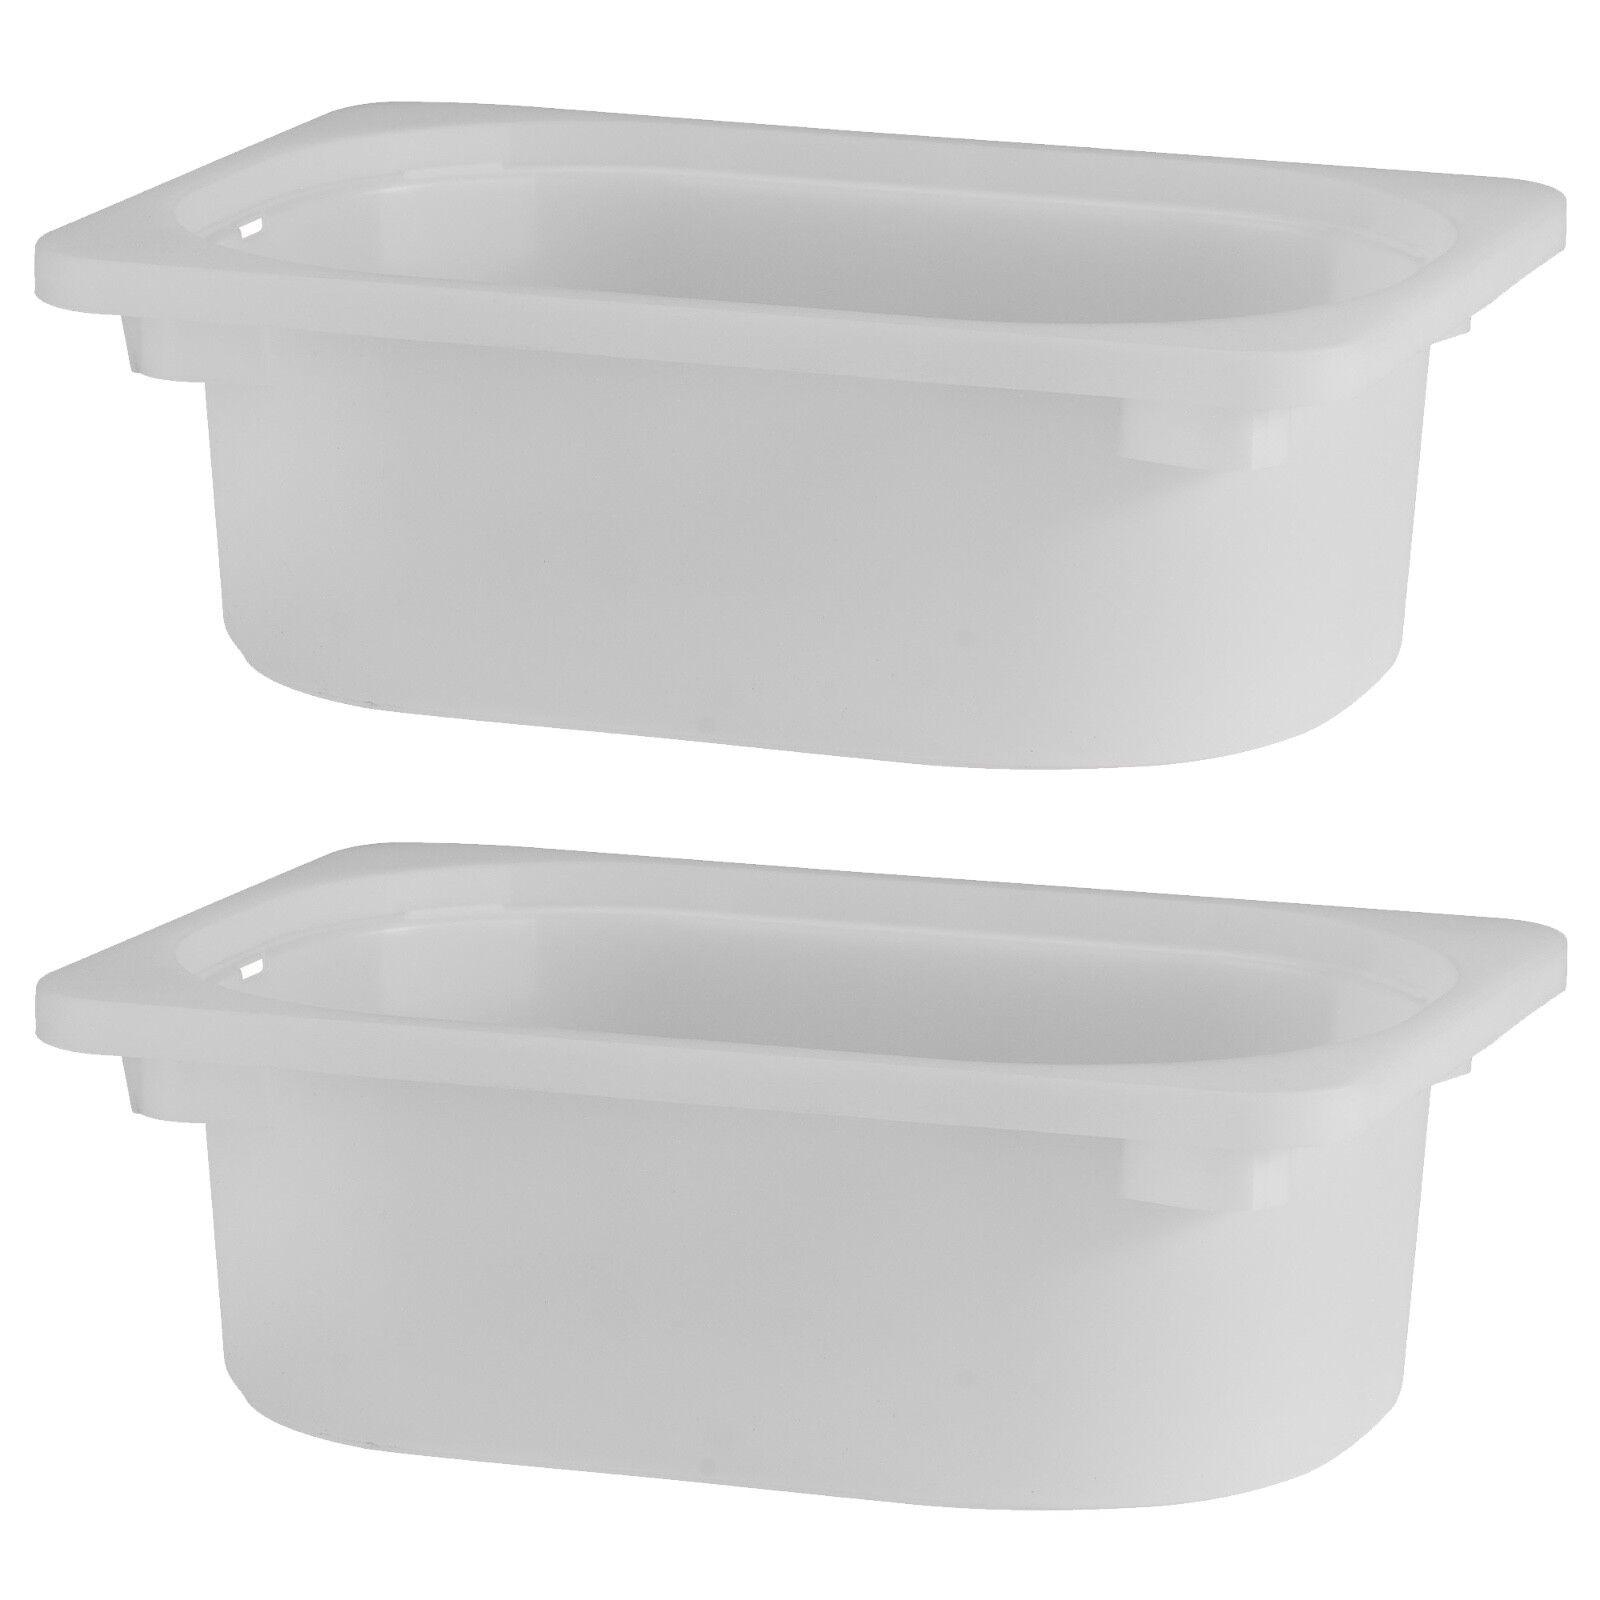 2 x IKEA TROFAST White Plastic Storage Boxes (20x30x10cm) | eBay